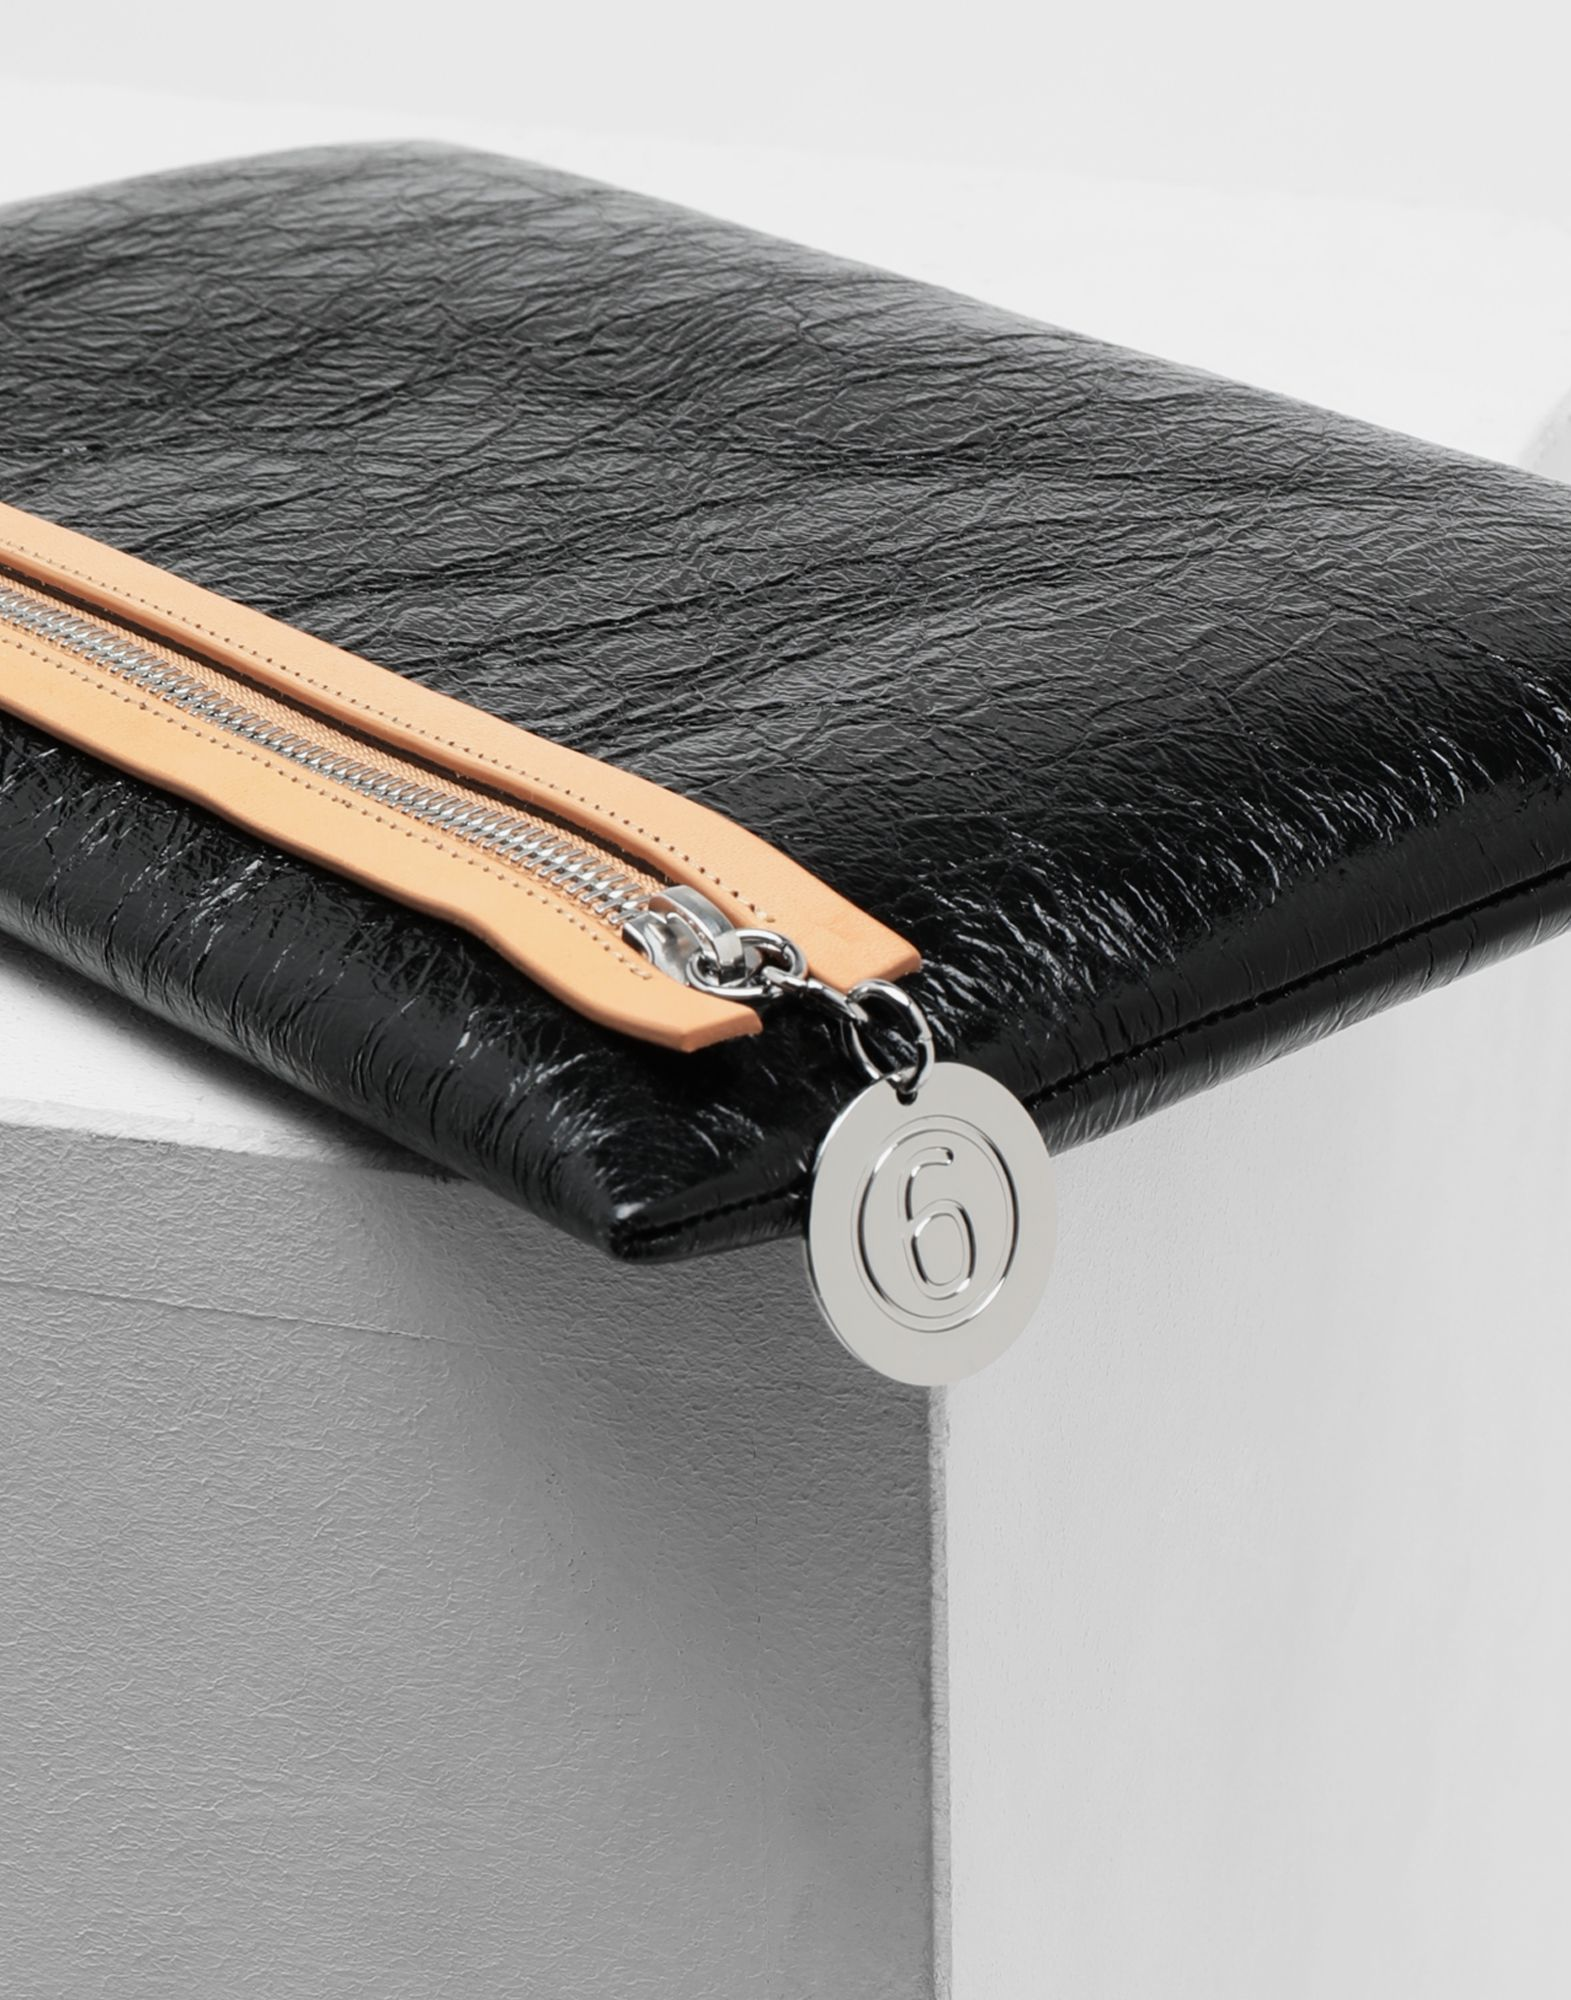 MM6 MAISON MARGIELA Crinkled leather zip pochette Wallets Woman d